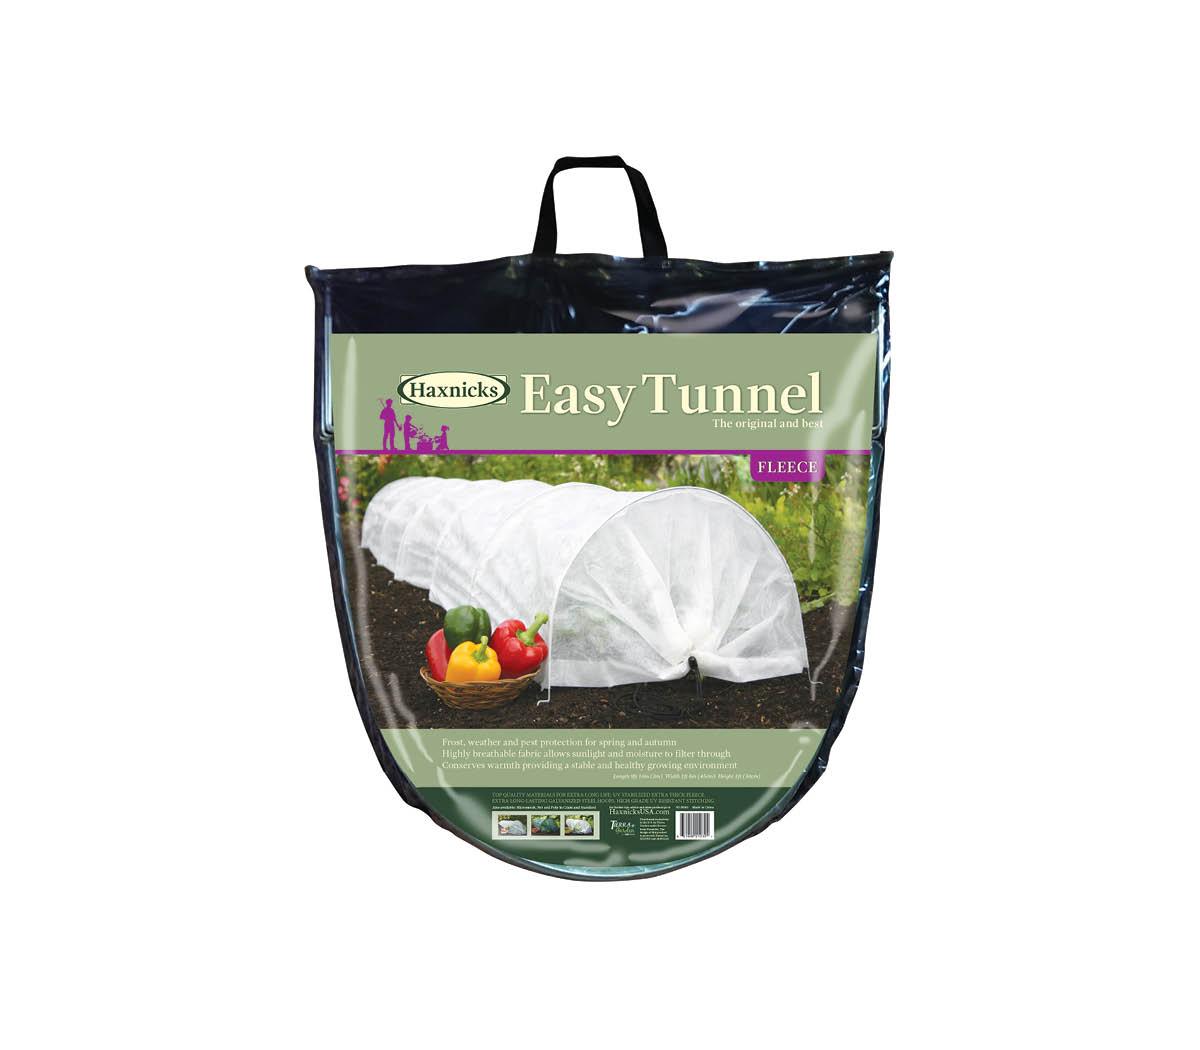 Haxnicks Standard Fleece Easy Tunnel.jpg